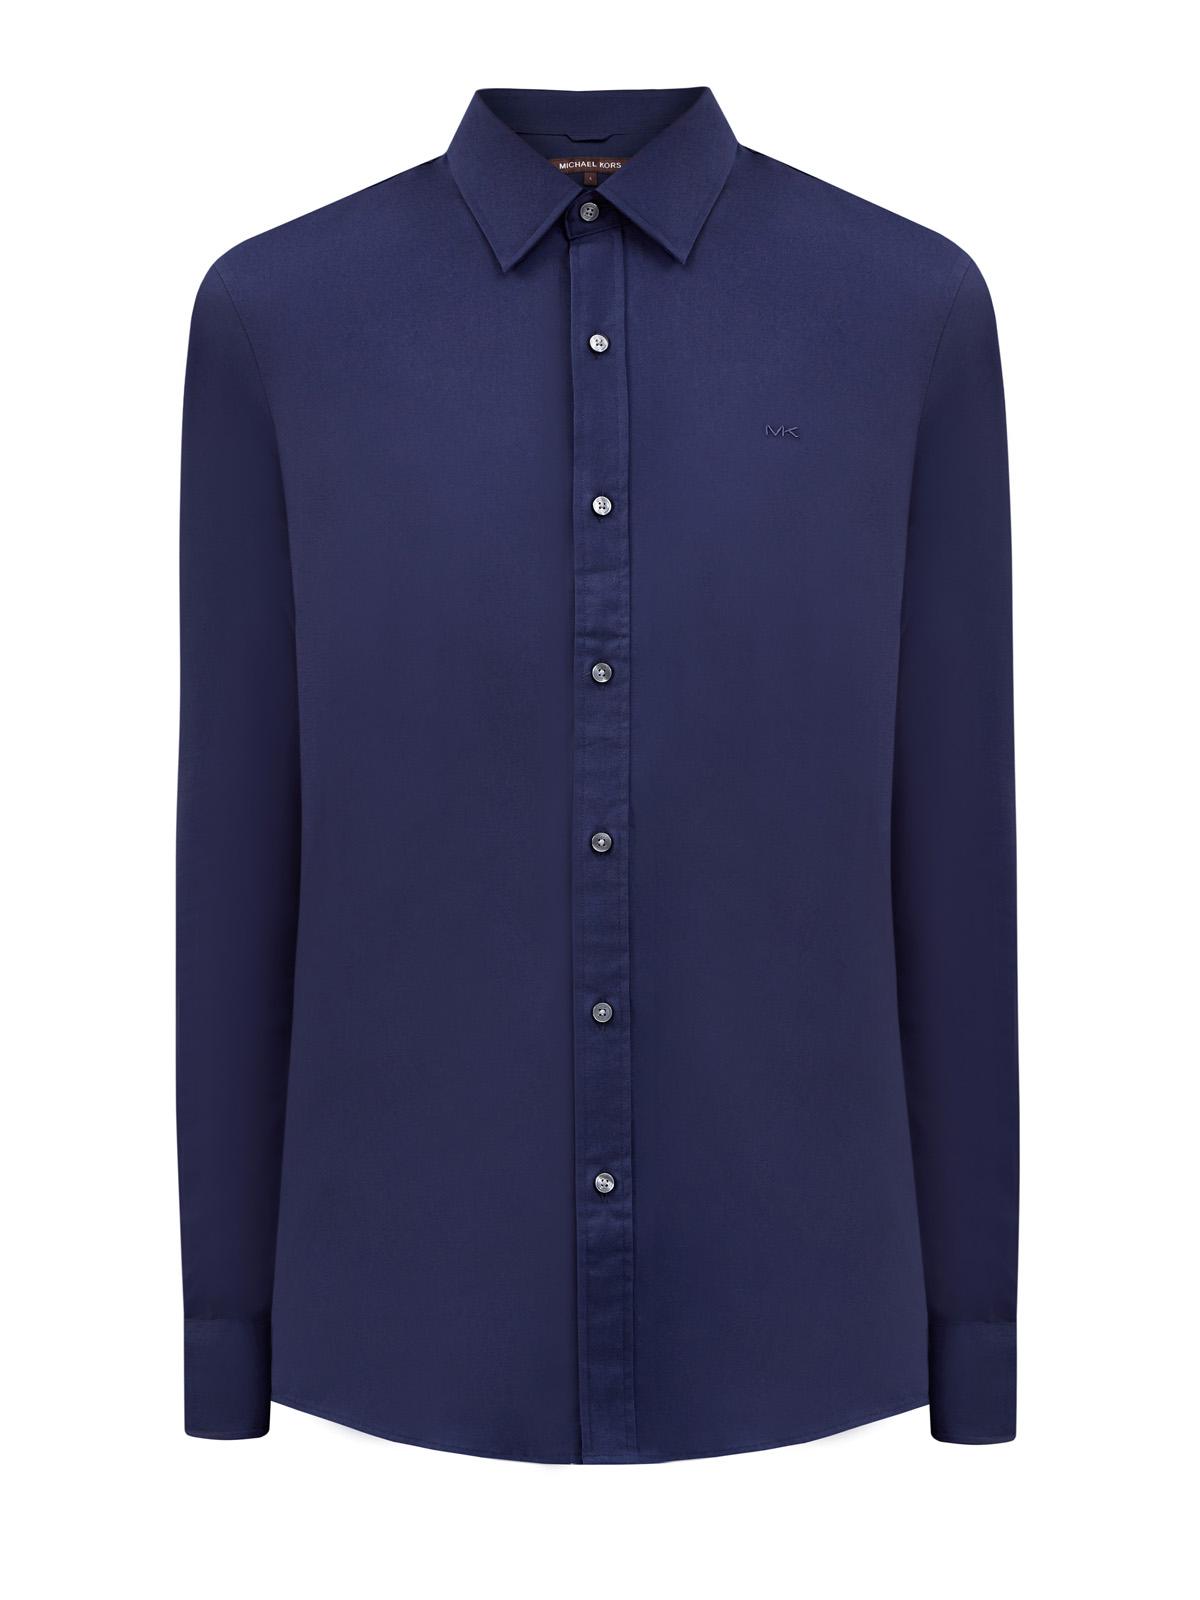 Рубашка вклассическом стиле изгладкого хлопка